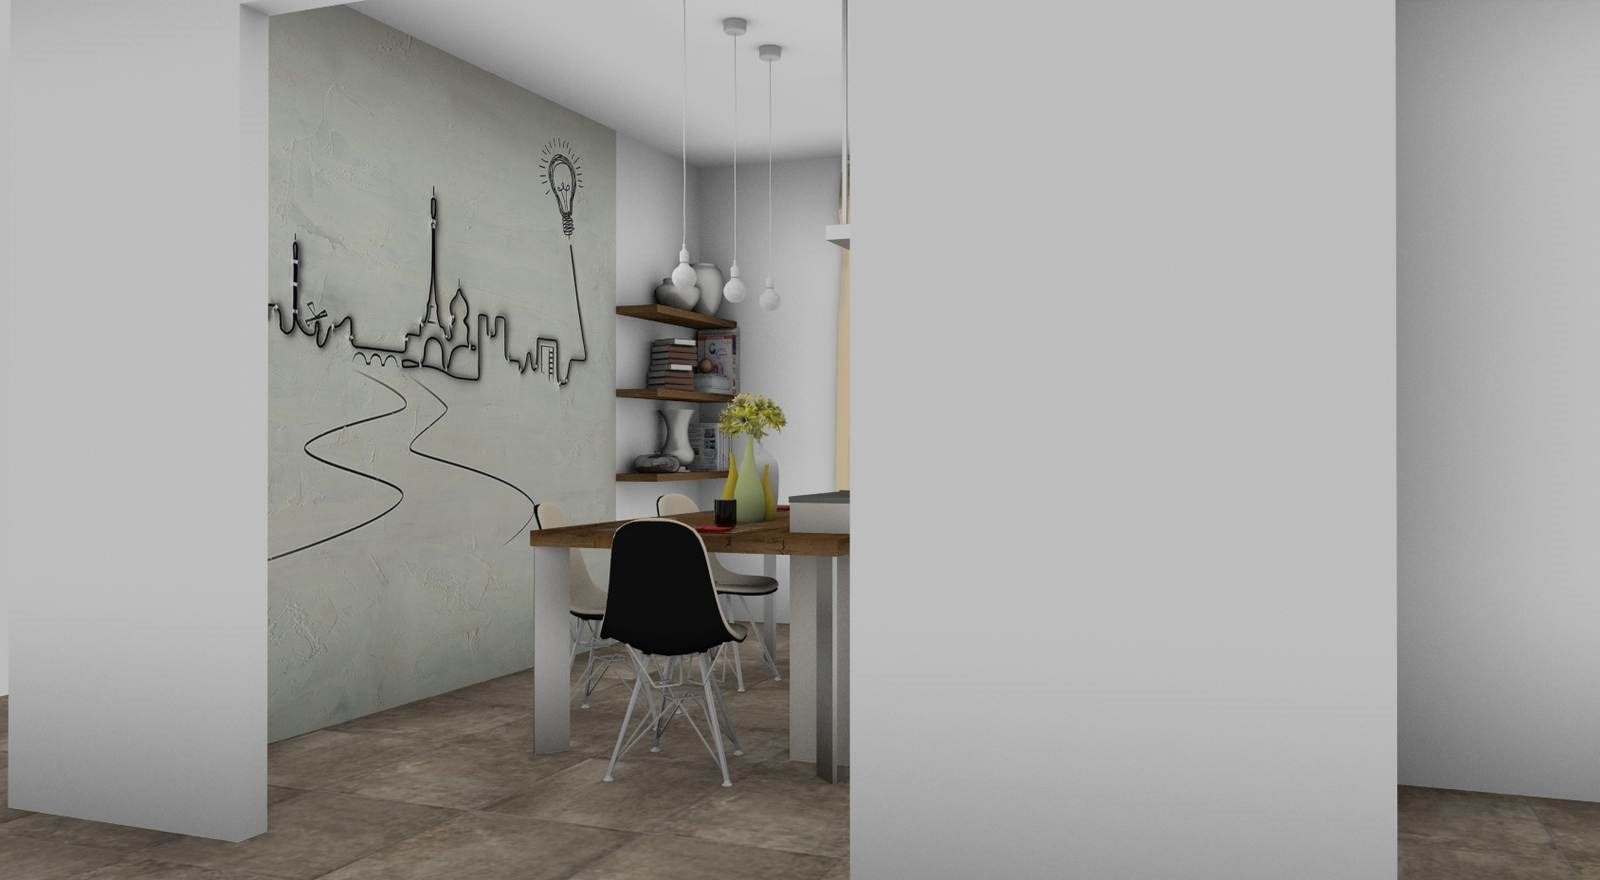 cucina Sistematica rendering 2